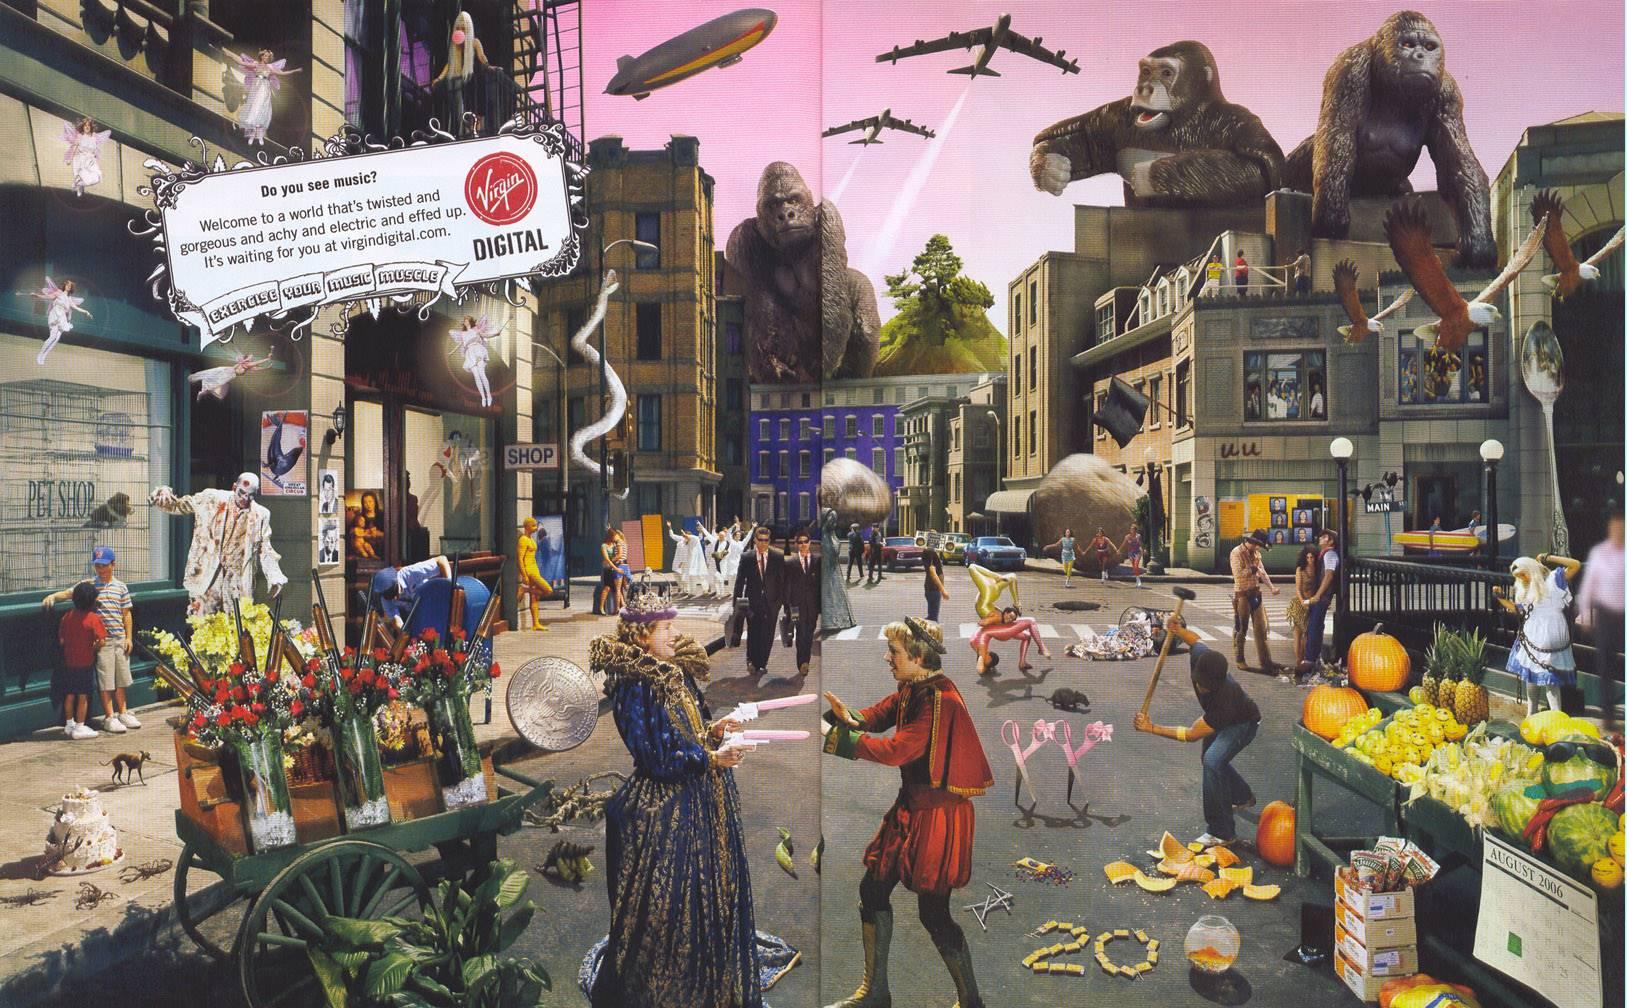 75 Artists By Virgin Records Quiz